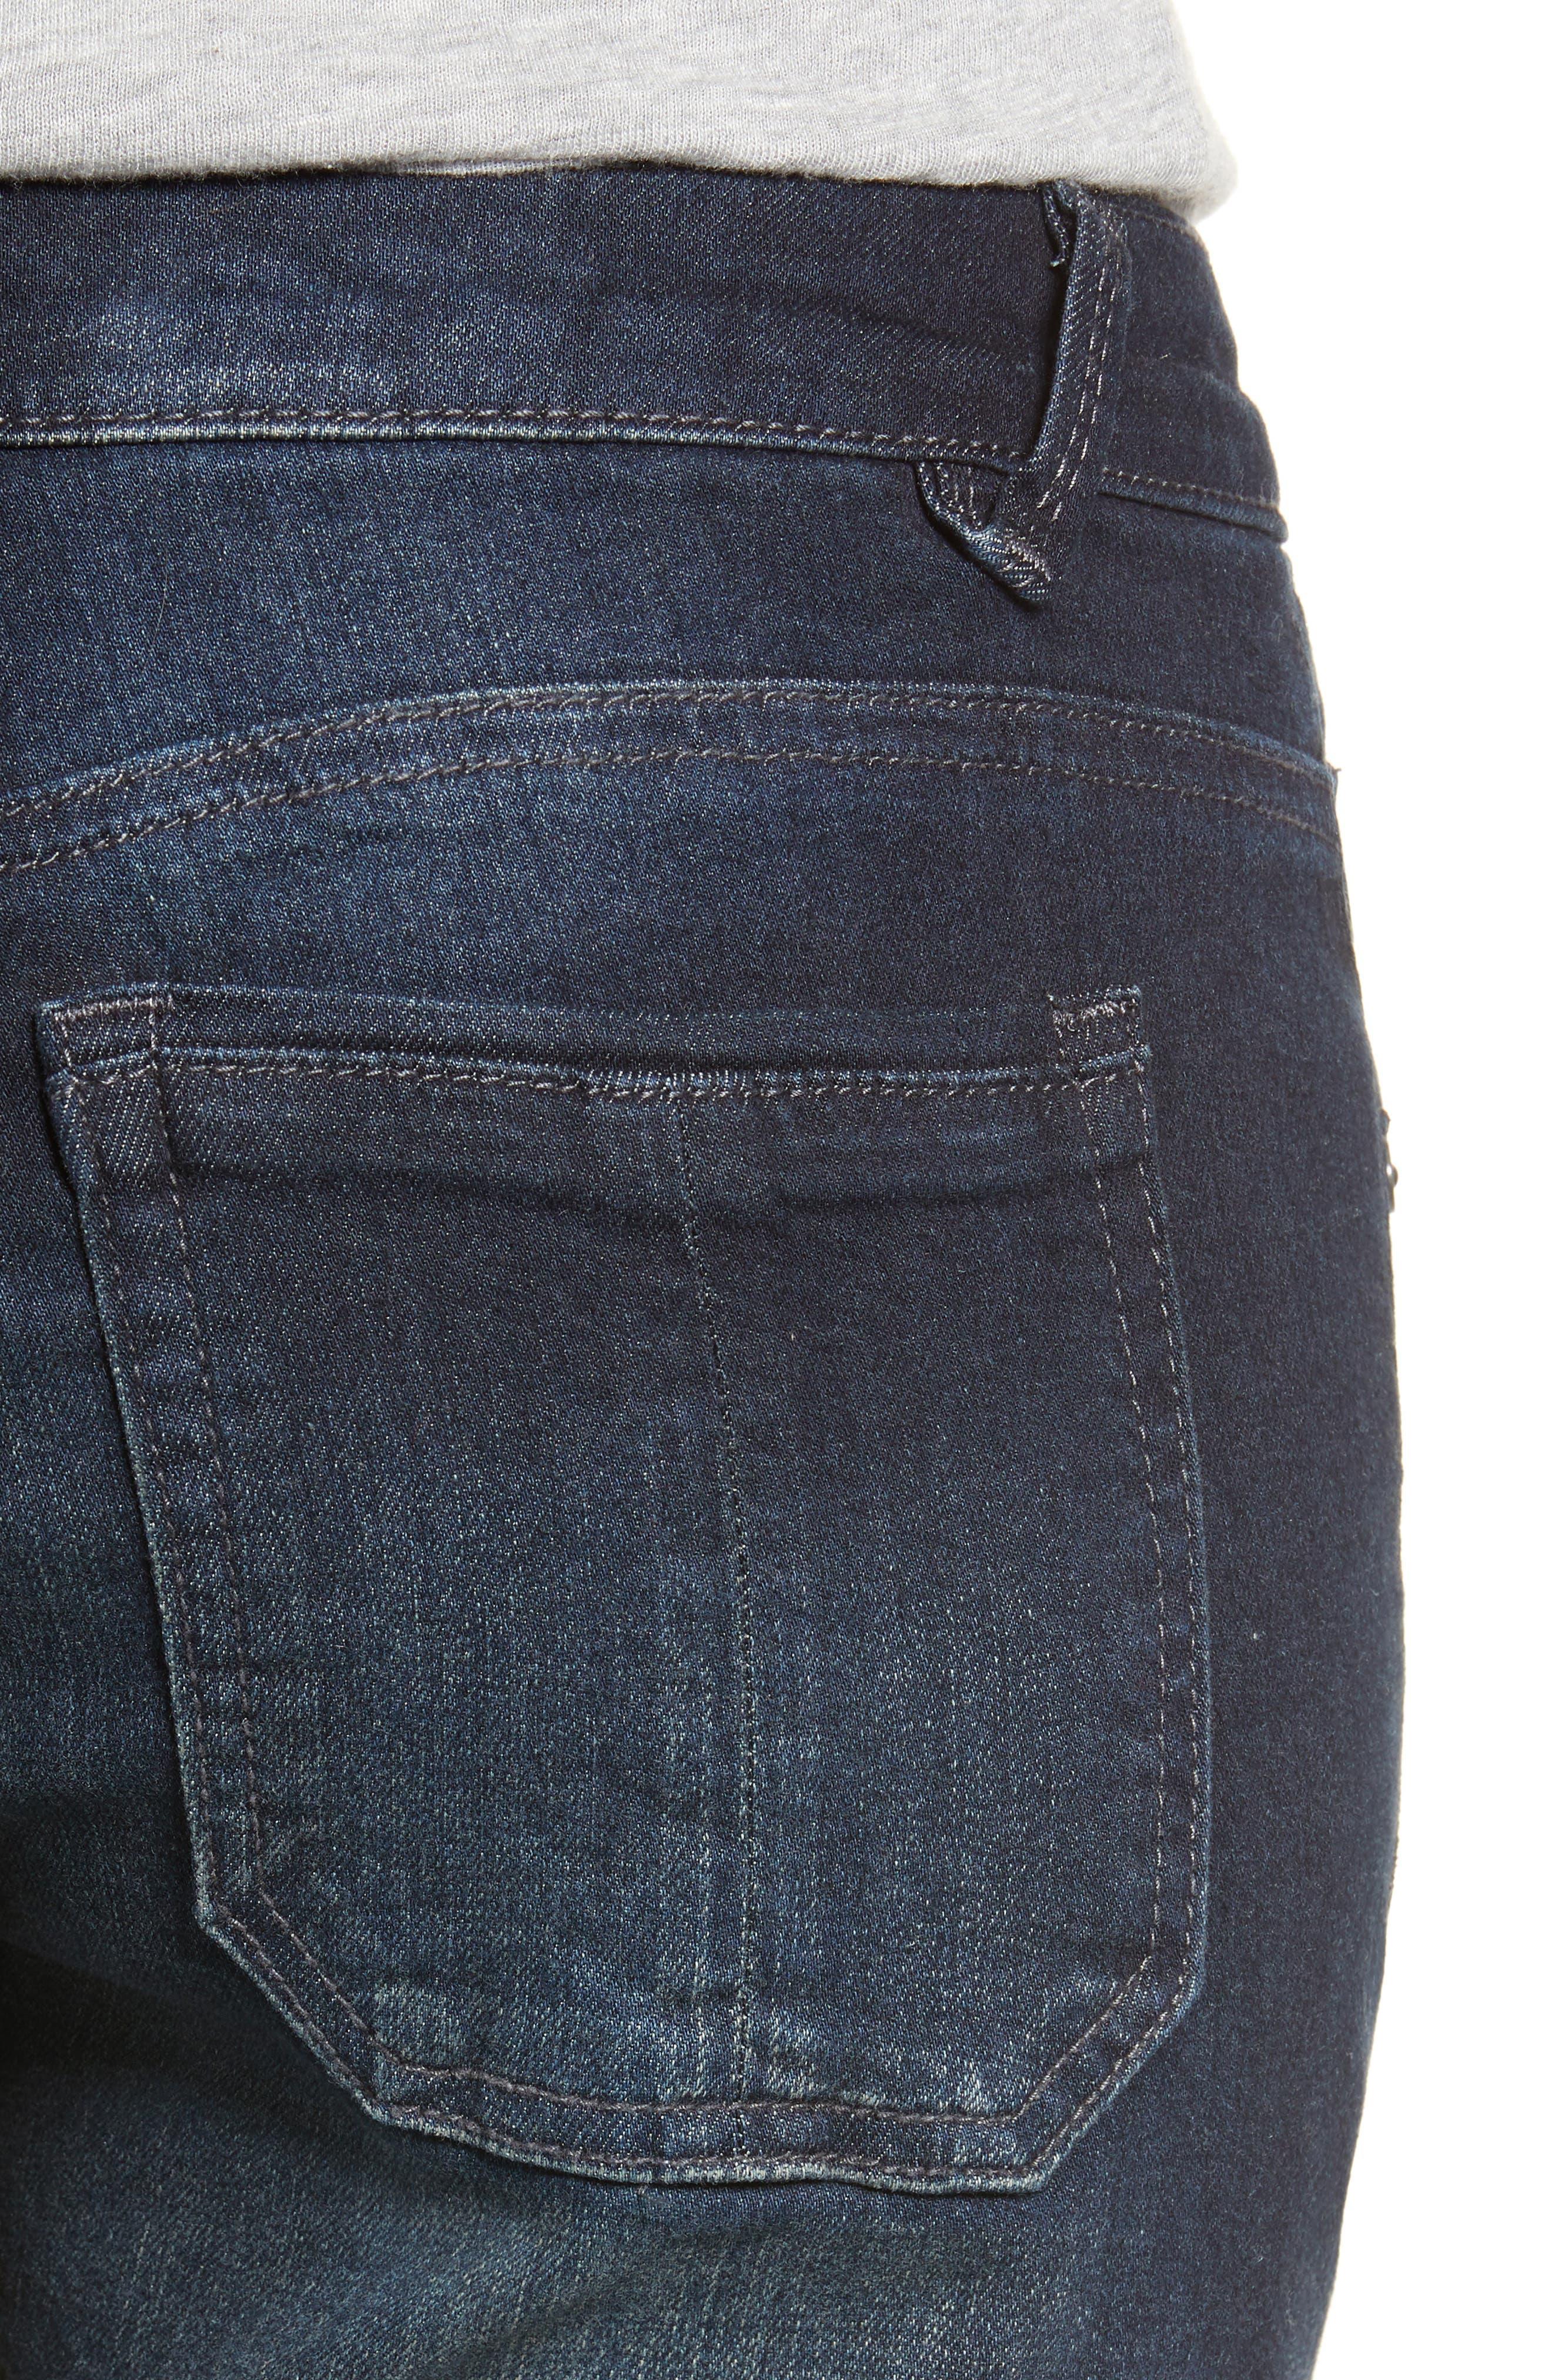 Seamless Ankle Skimmer Jeans,                             Alternate thumbnail 4, color,                             402